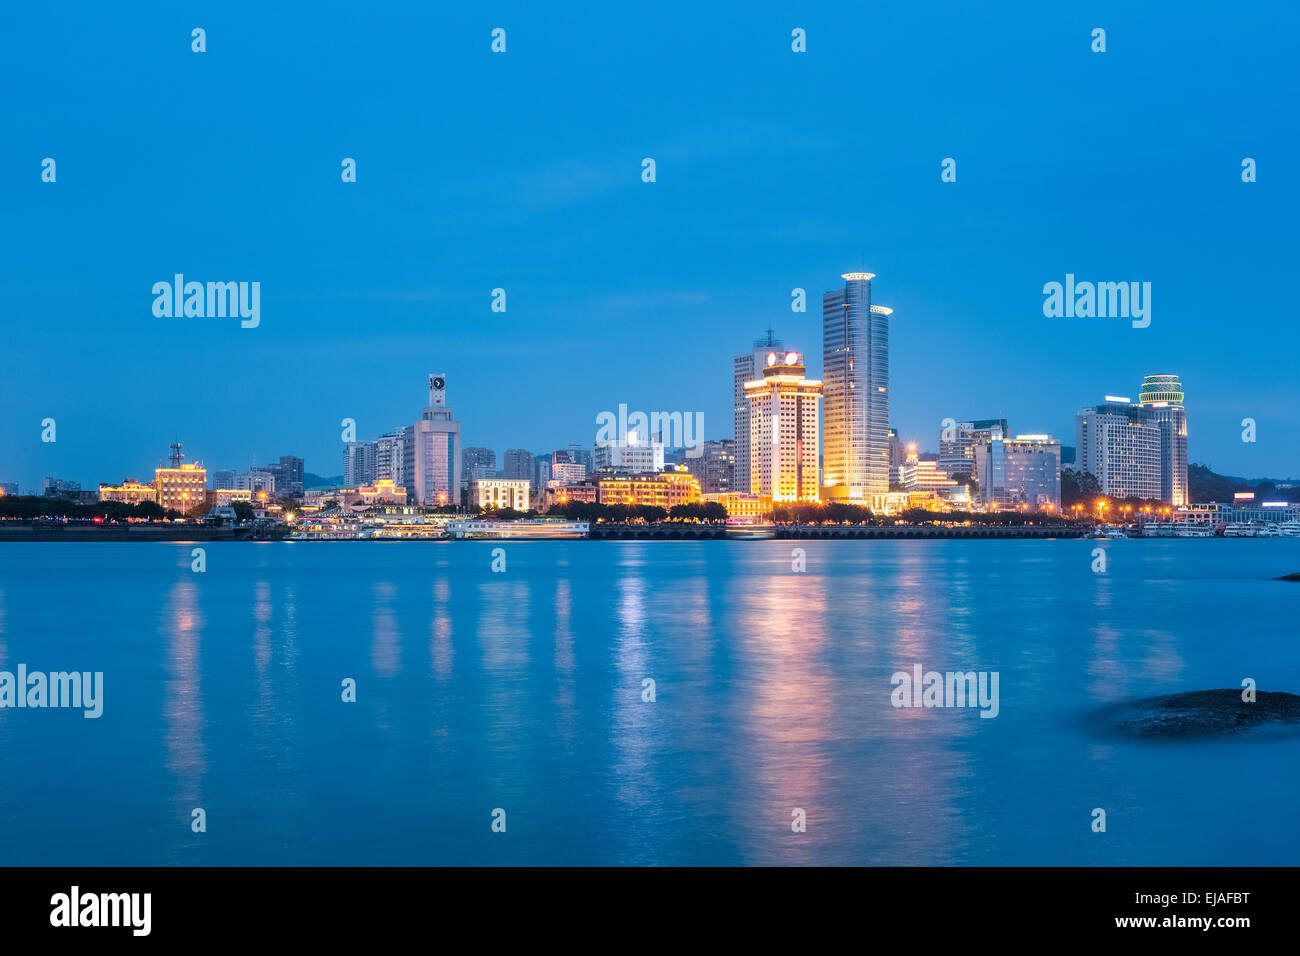 xiamen skyline closeup at night - Stock Image